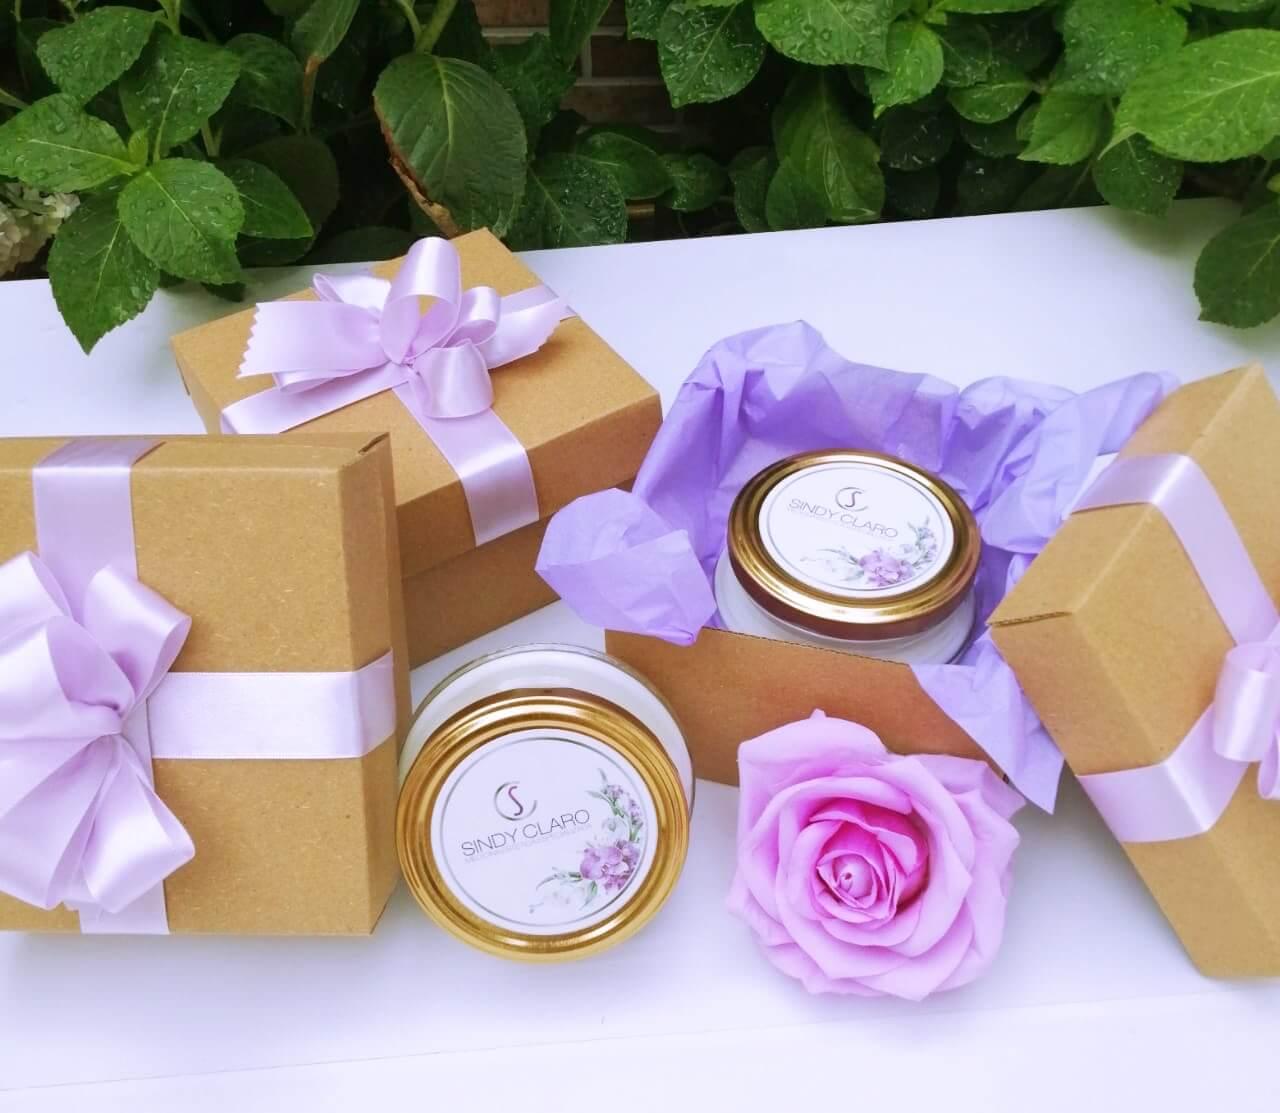 Velas perfumadas, velas en cera de palma,  velas decorativas, aromalife nature, velas aromaticas, velas, eventos, regalos